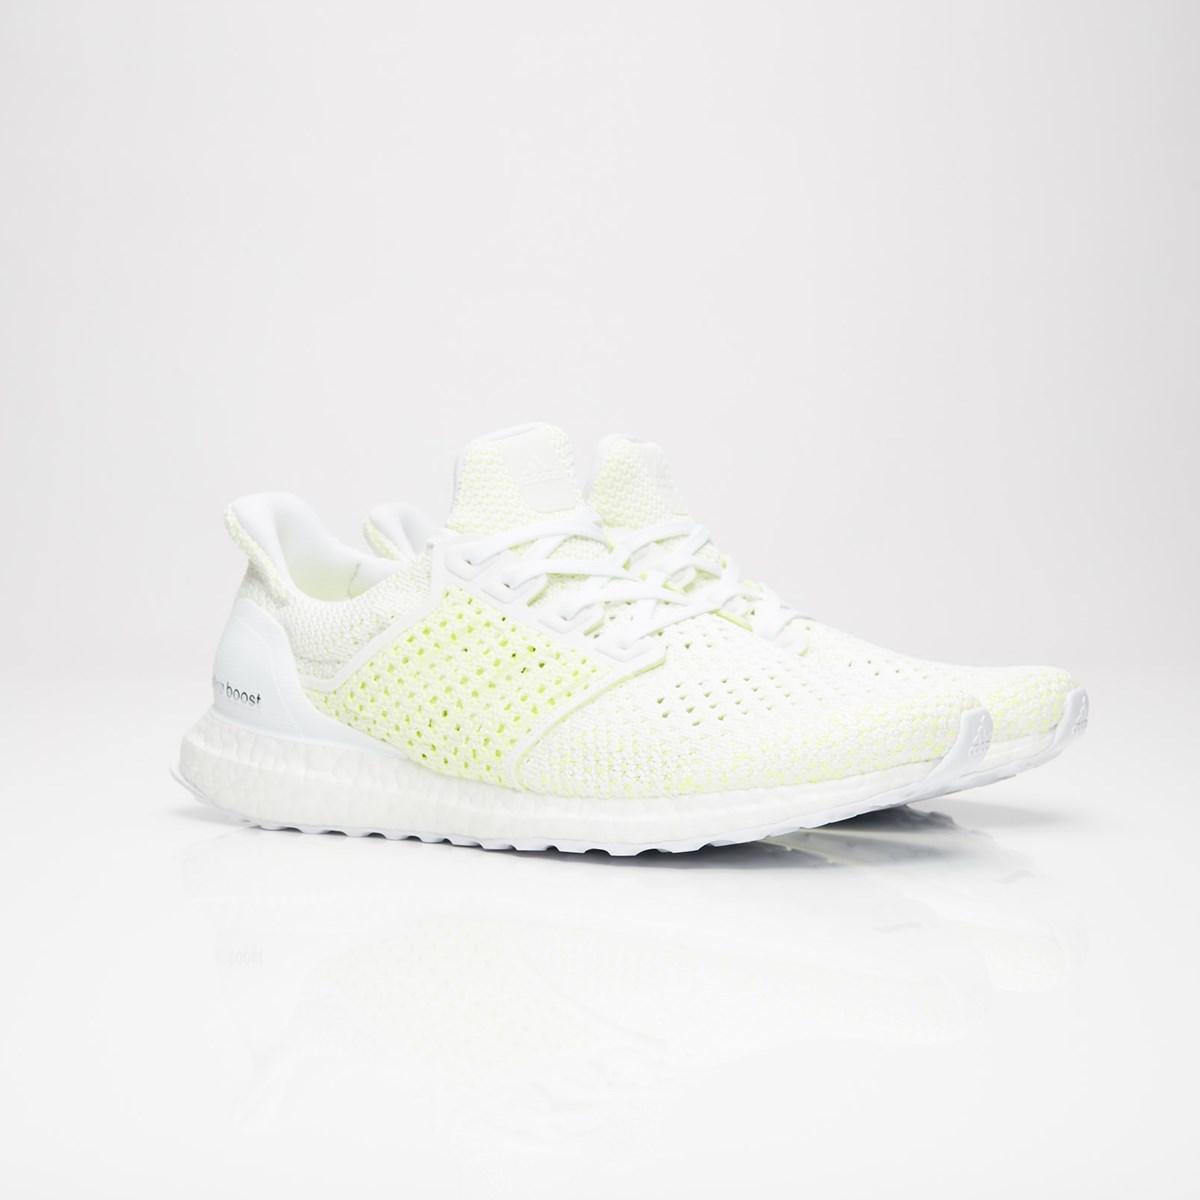 3baacf40a adidas Ultraboost Clima - Aq0481 - Sneakersnstuff